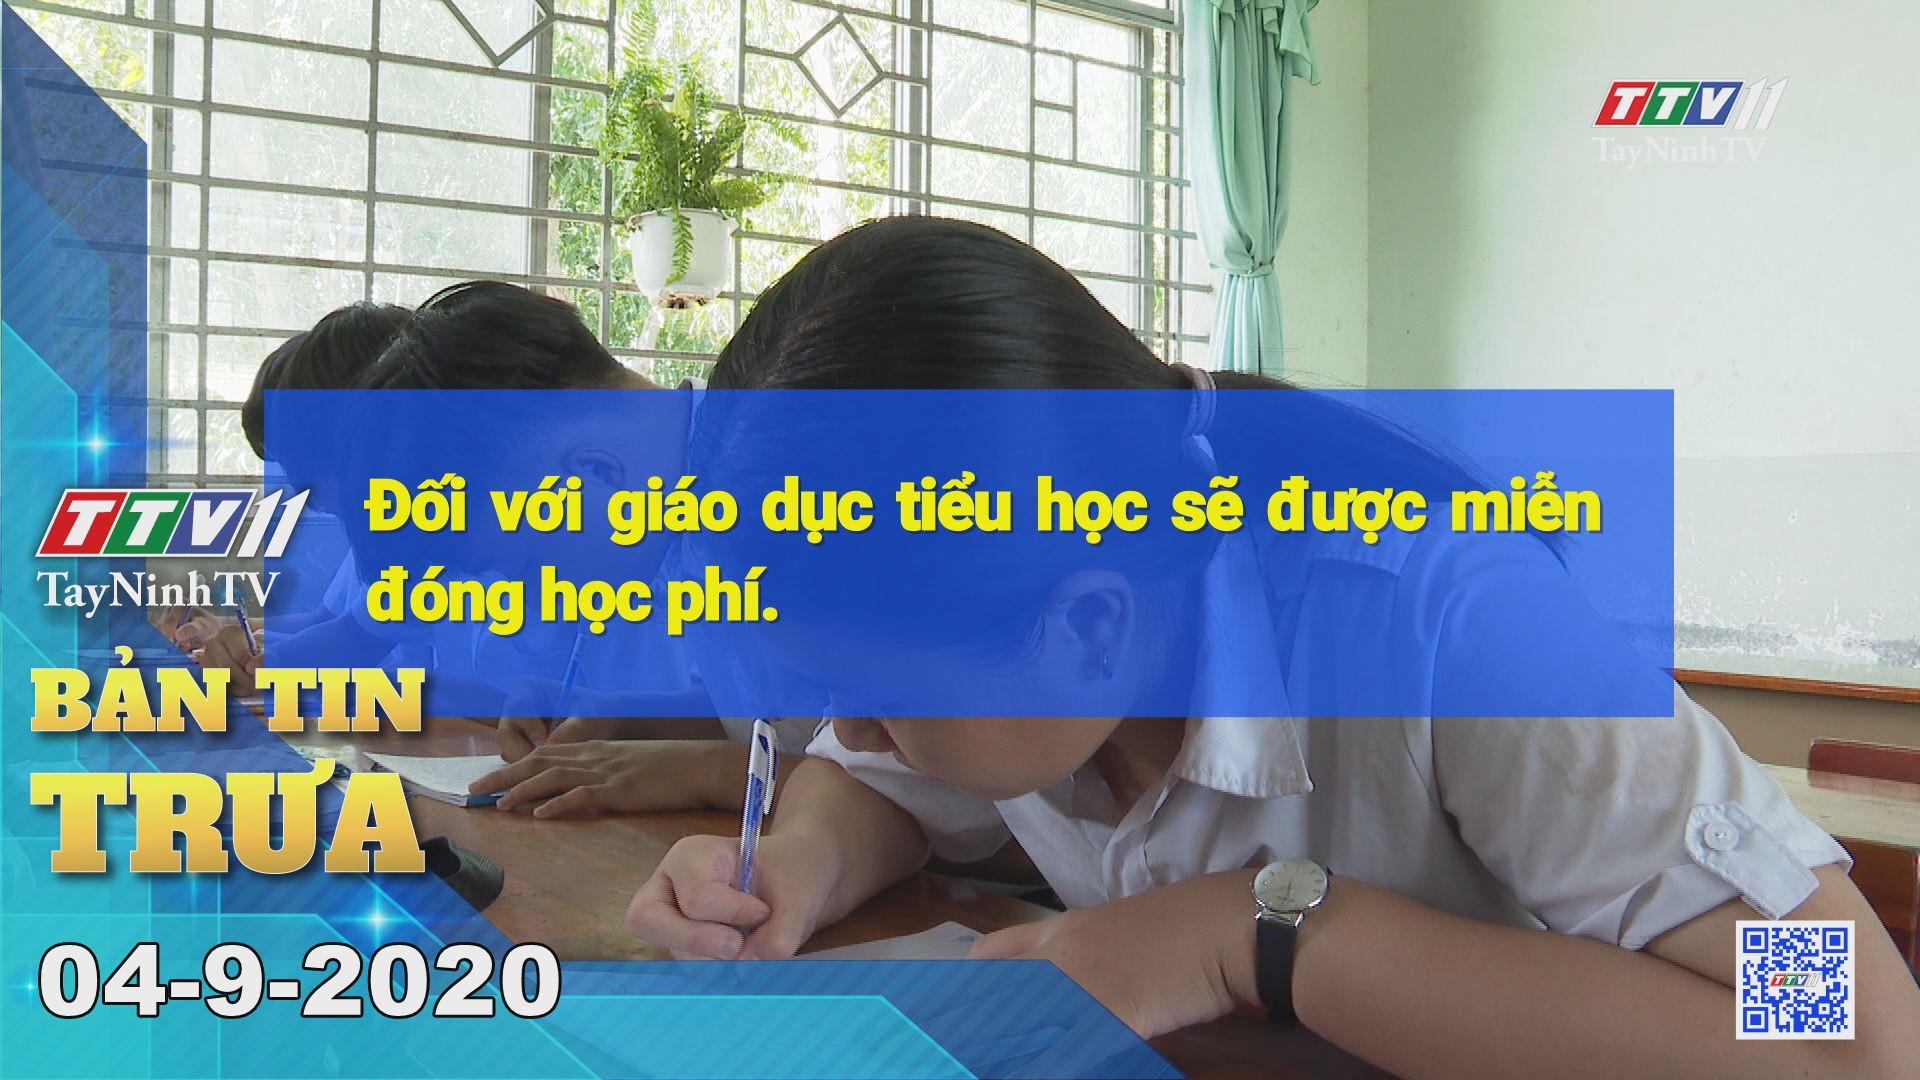 Bản tin trưa 04-9-2020 | Tin tức hôm nay | TayNinhTV